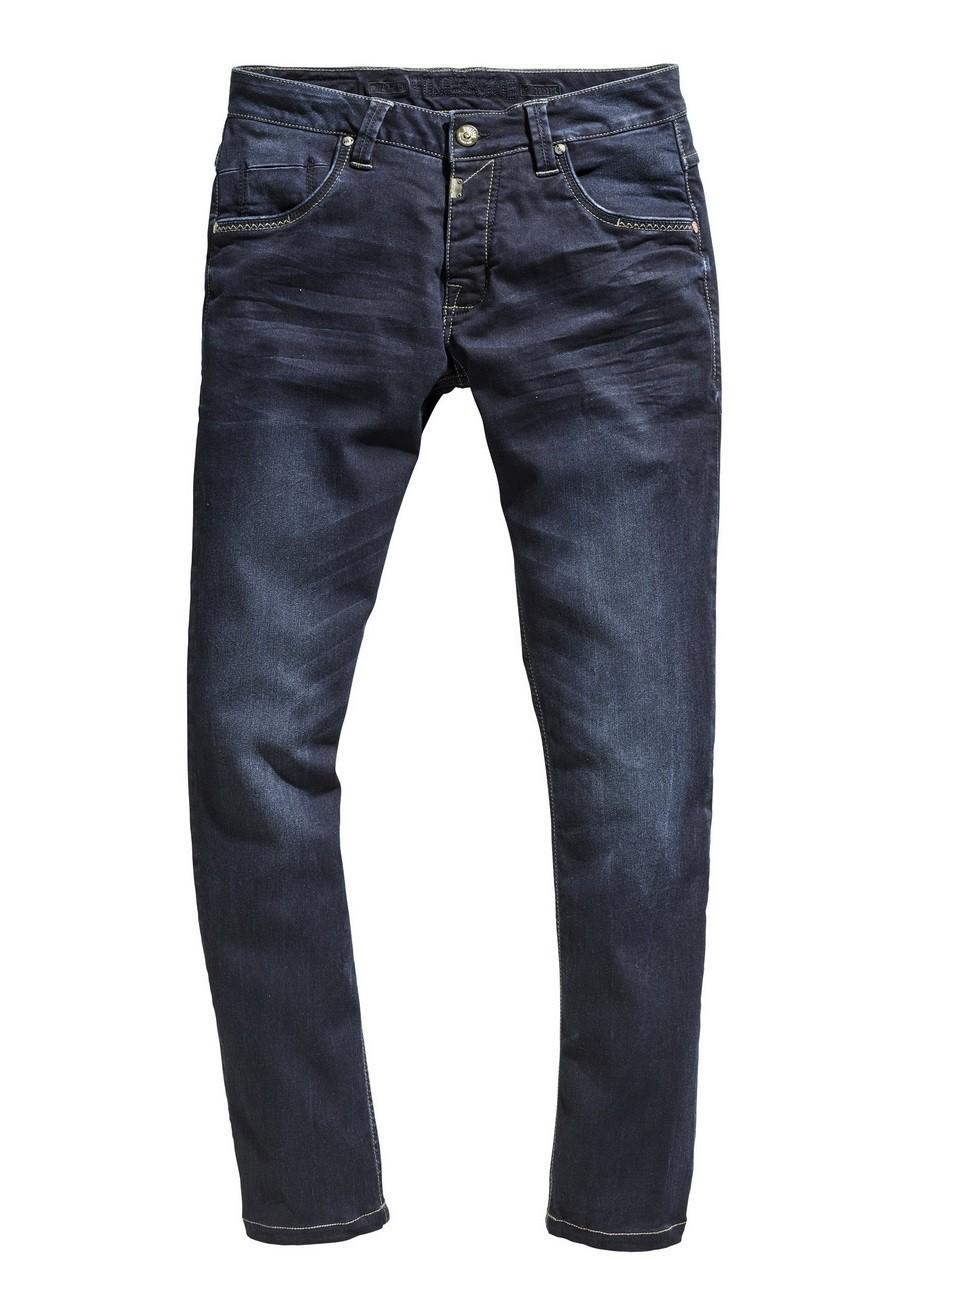 Timezone Herren Jeans EduardoTZ Slim Fit - Blau - Ink Shadow Wash